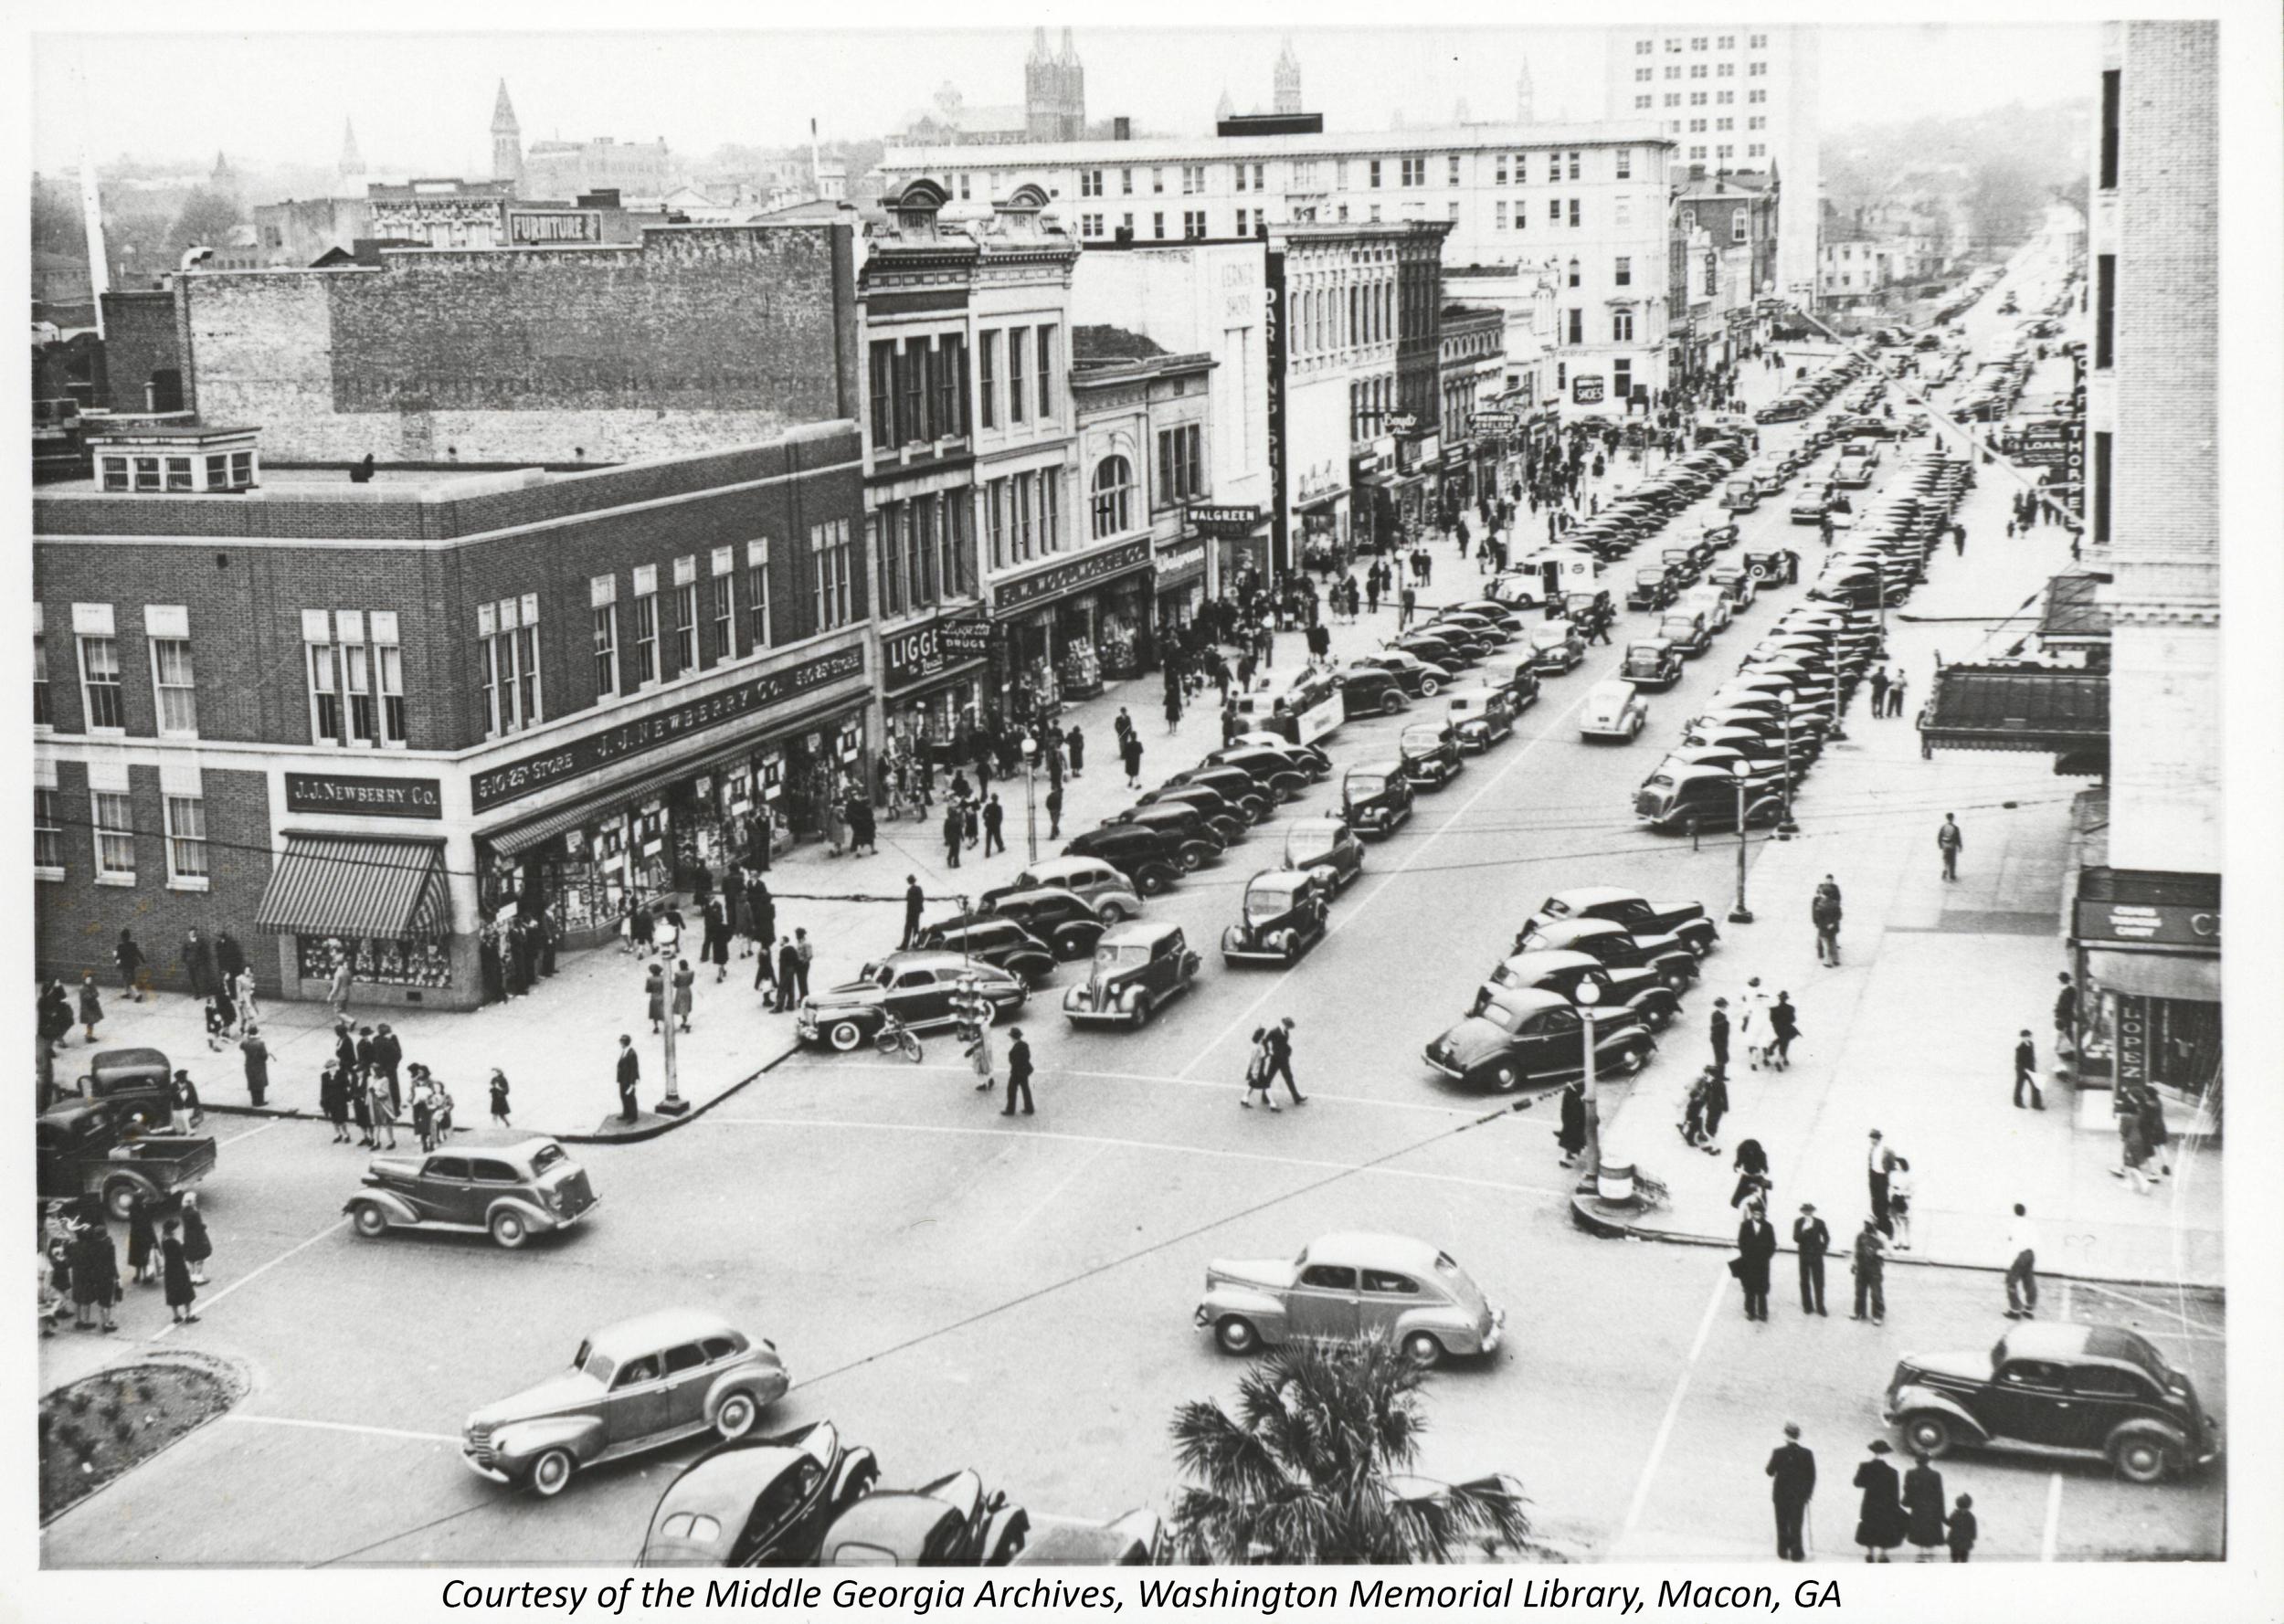 Downtown Macon, GA in 1948